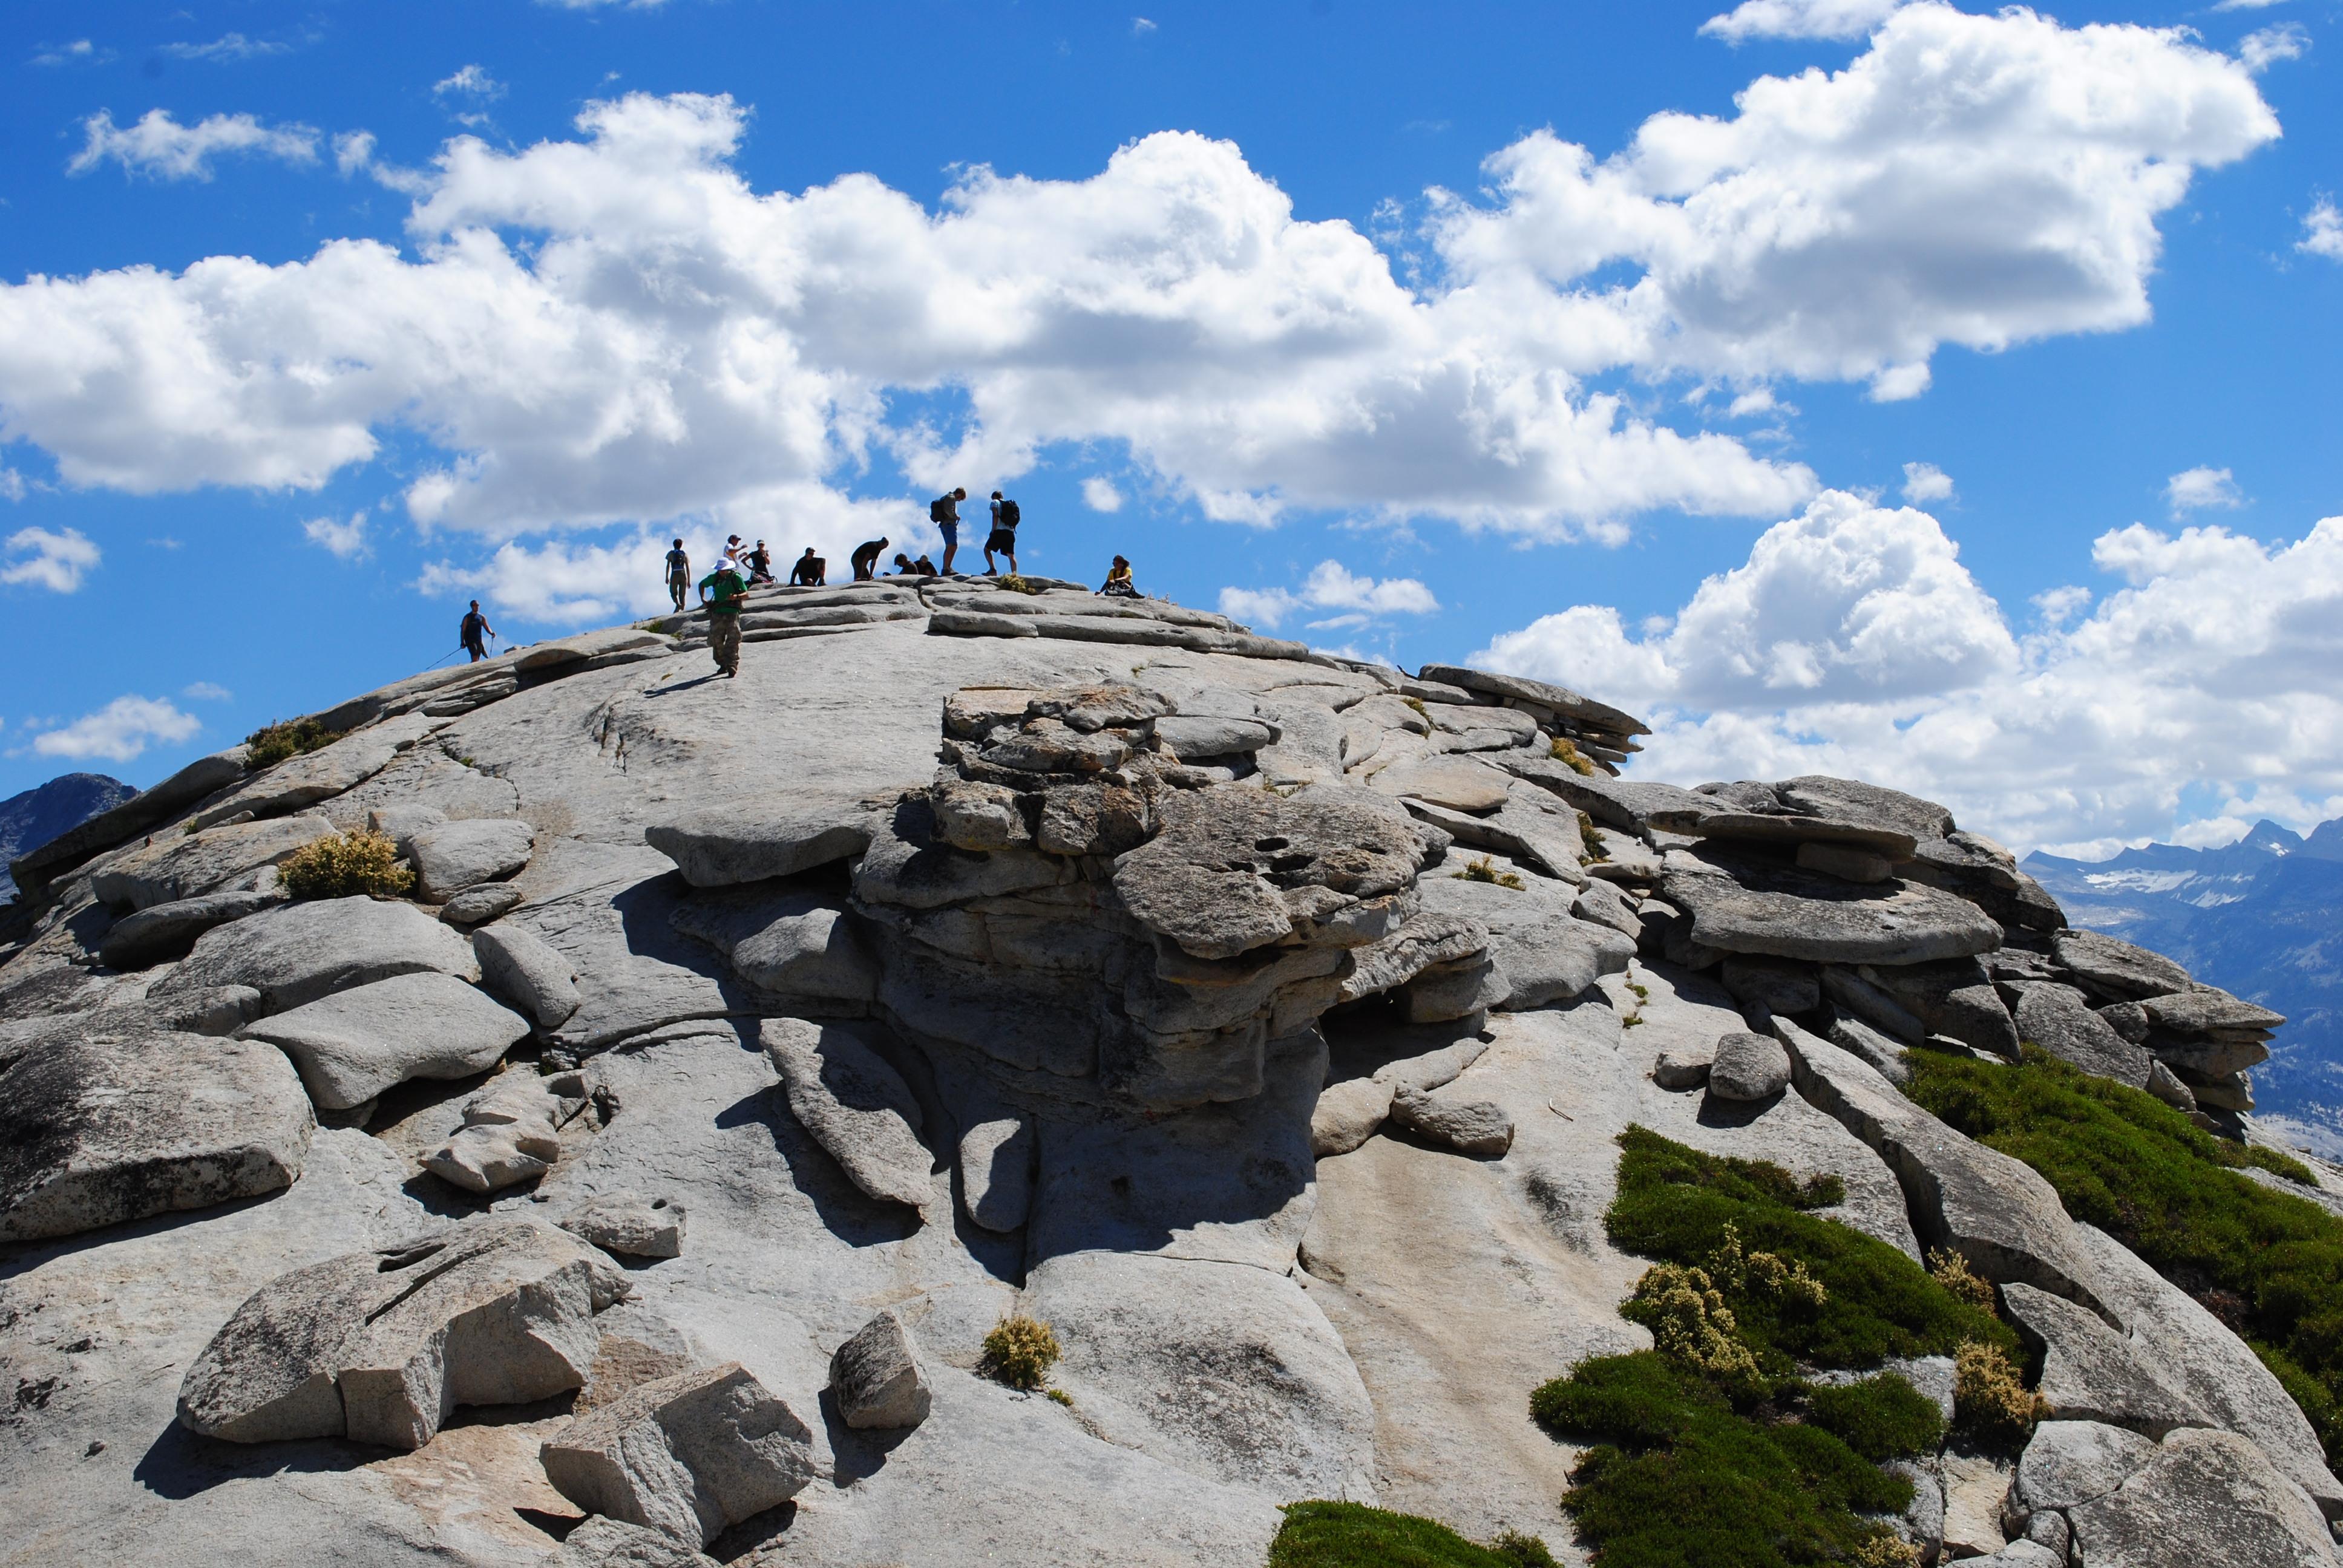 Sub-dome, Yosemite National Park